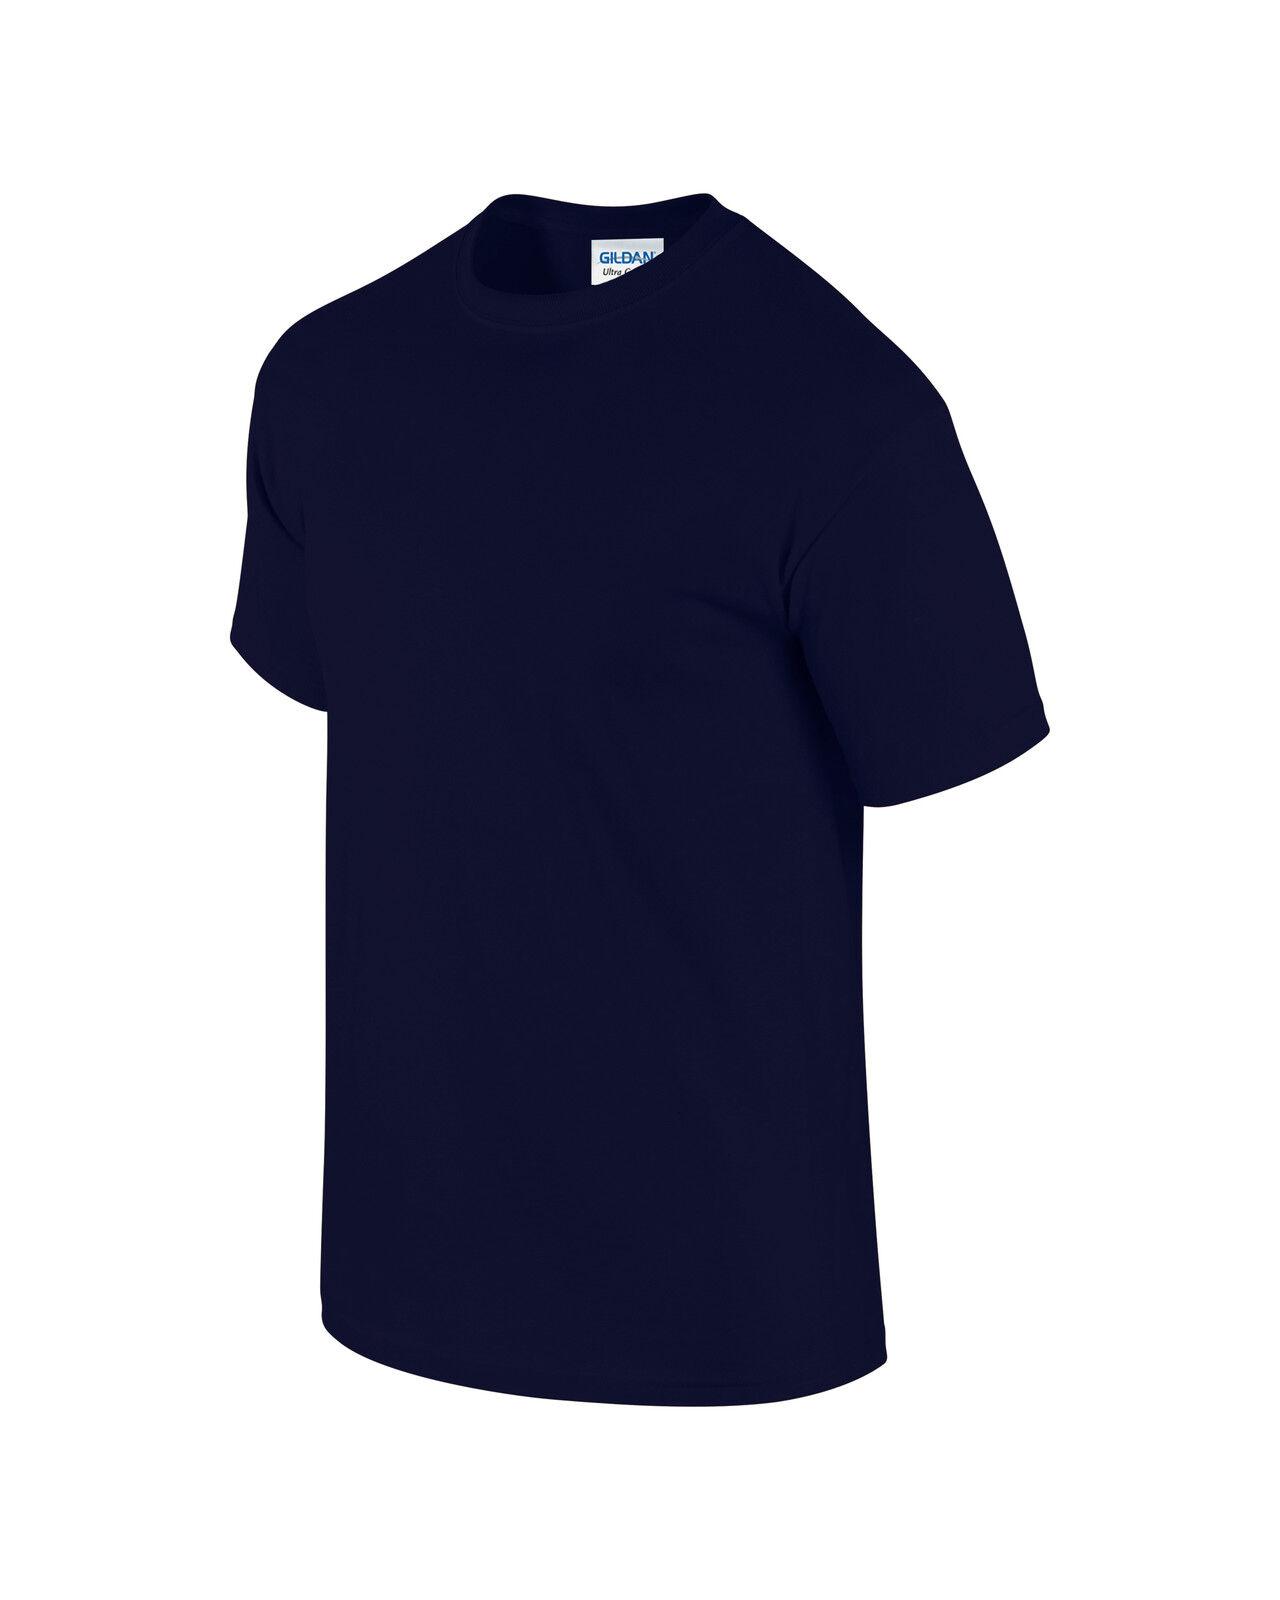 IMPORTED NAVY blueE PLAIN 100% COTTON T SHIRT XXXXXL 5XL GD02